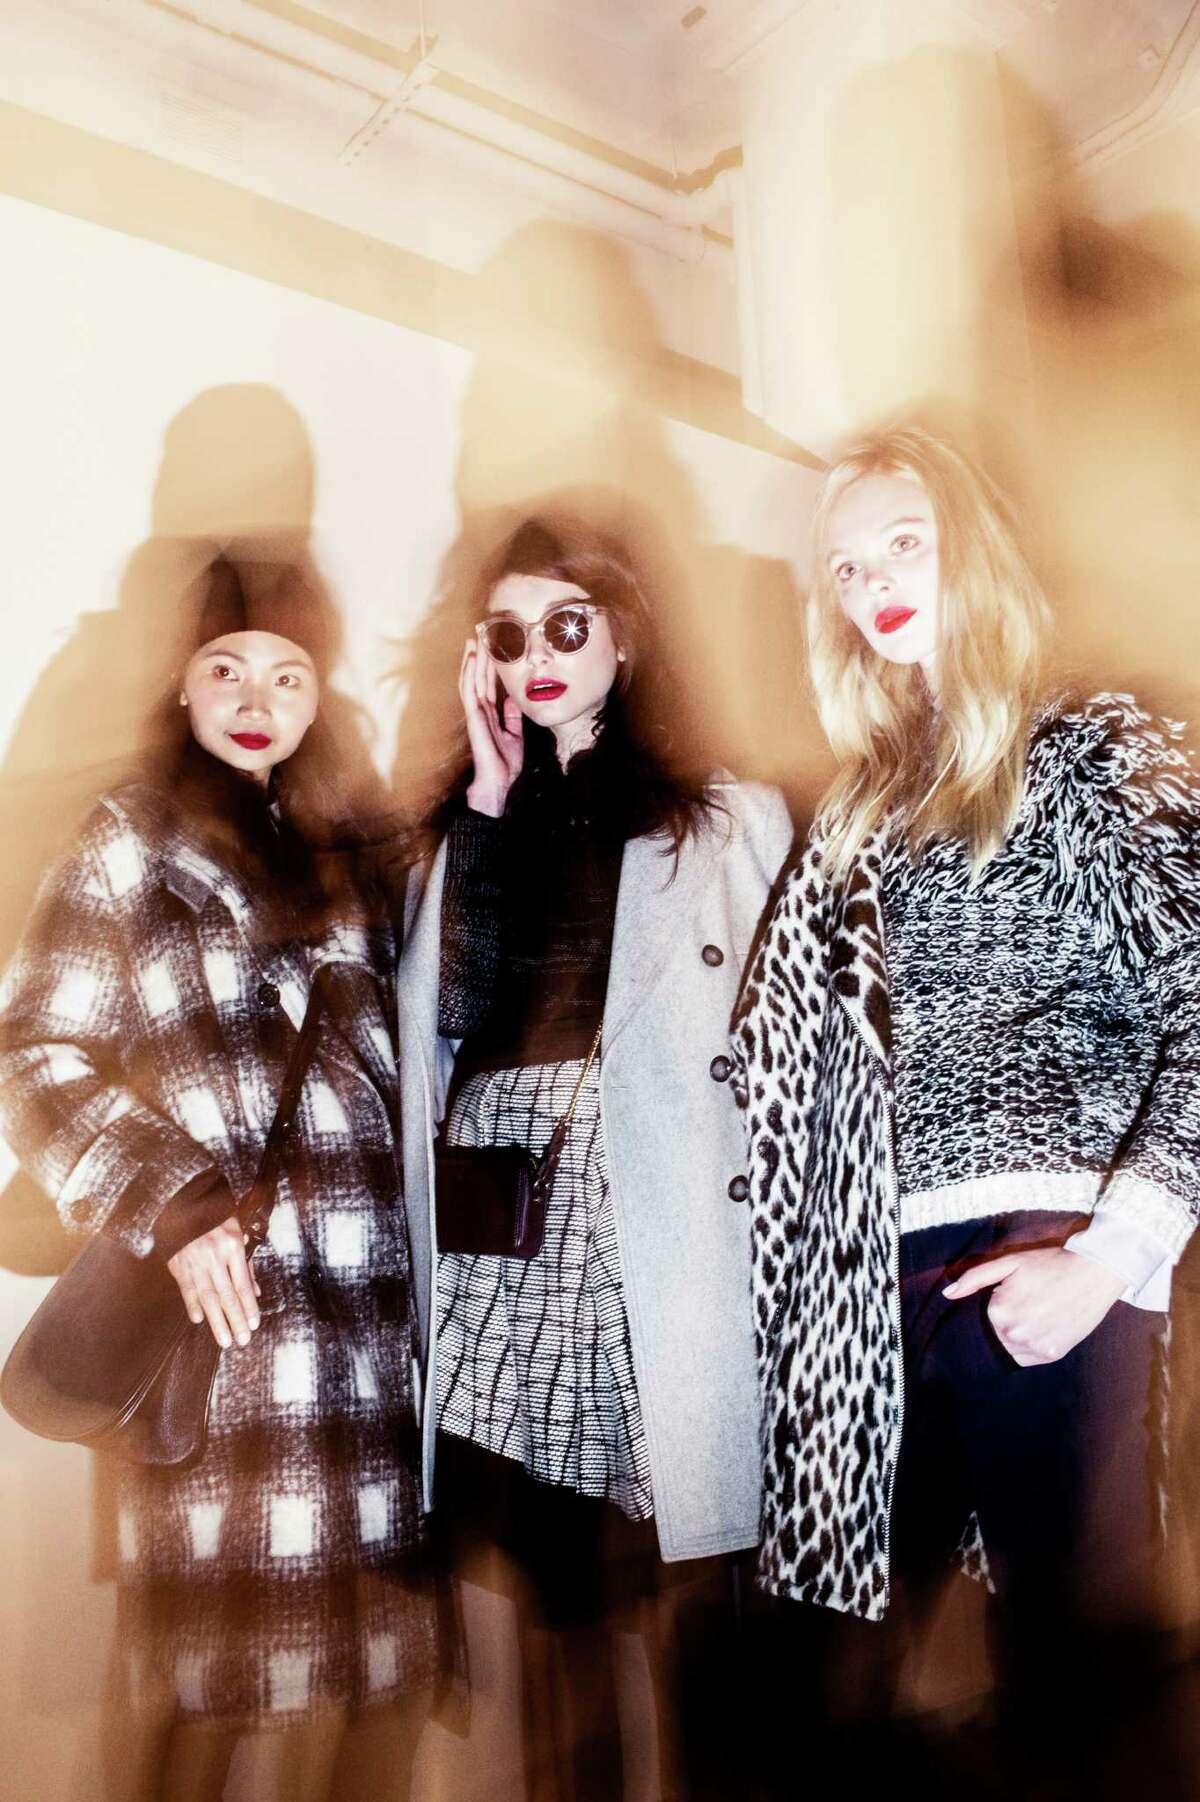 Models in fall 2015 looks at Banana Republic's fashion week presentation Feb. 14 at Glasgow Caledonian University in Manhattan.